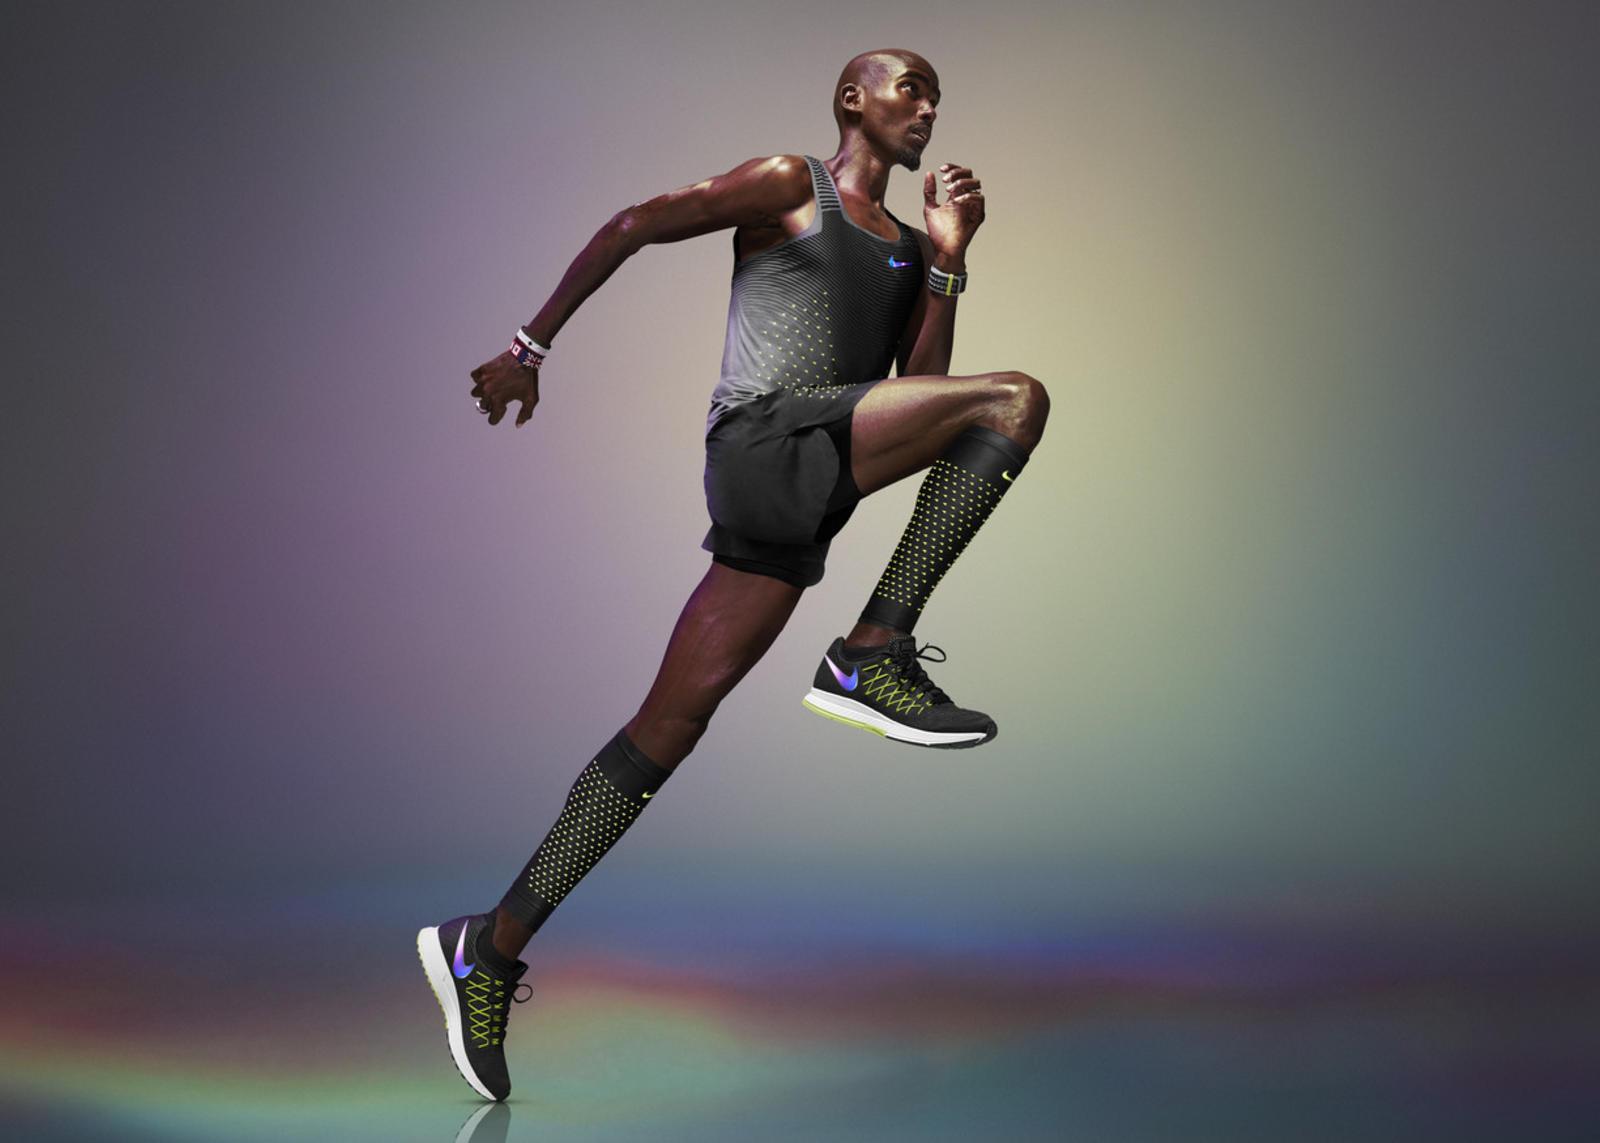 Mo Farah wearing Nike Vapor Track & Field Kit with AeroSwift Techology